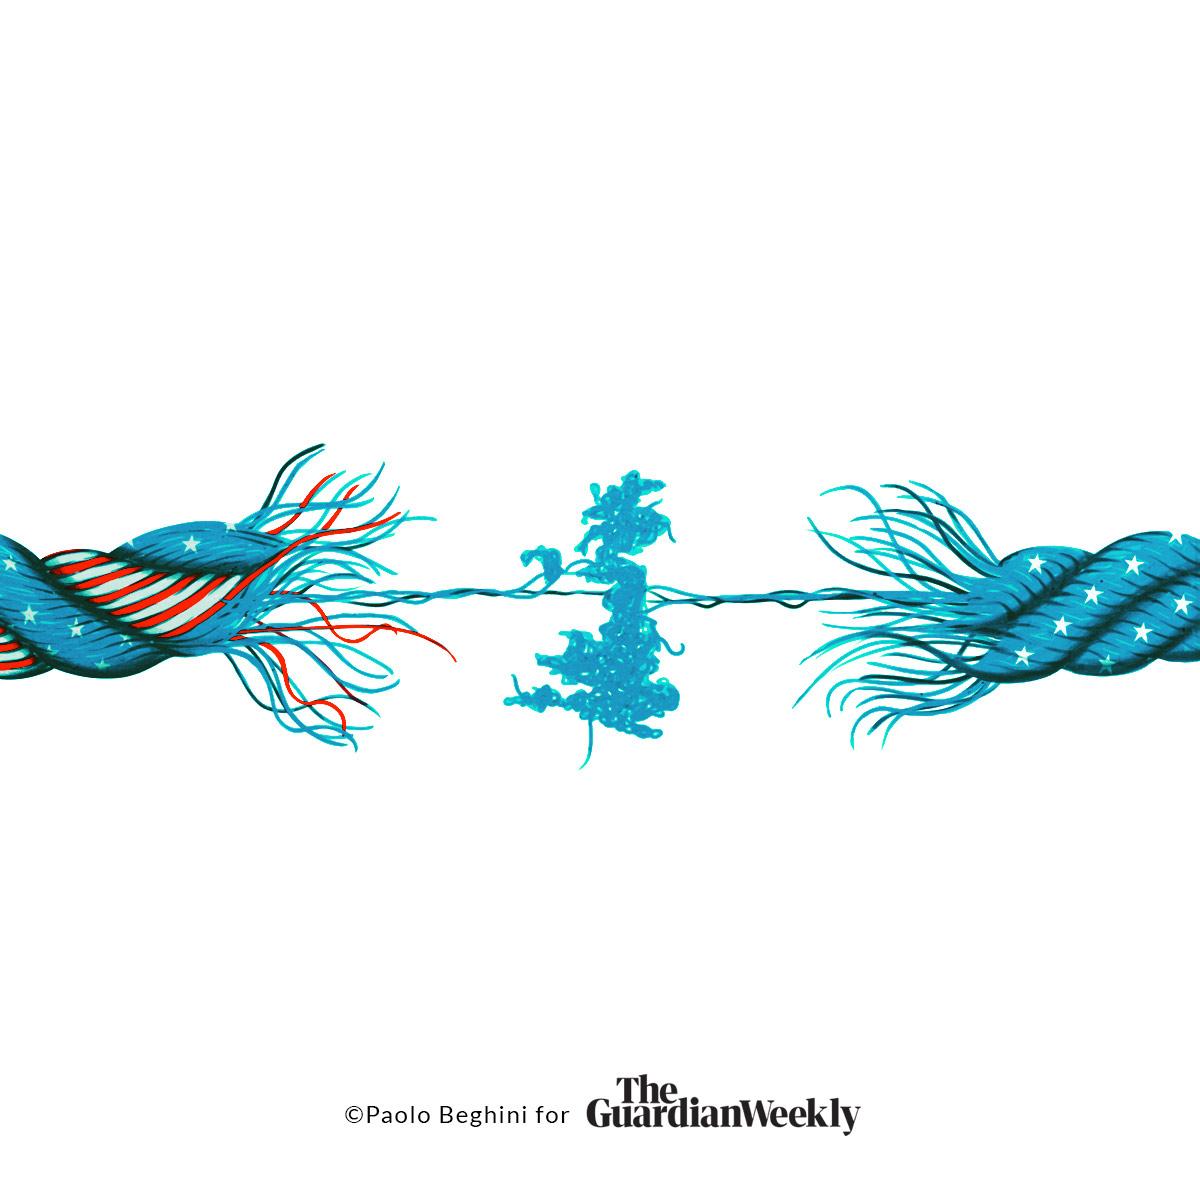 UK politics issue-spot illo